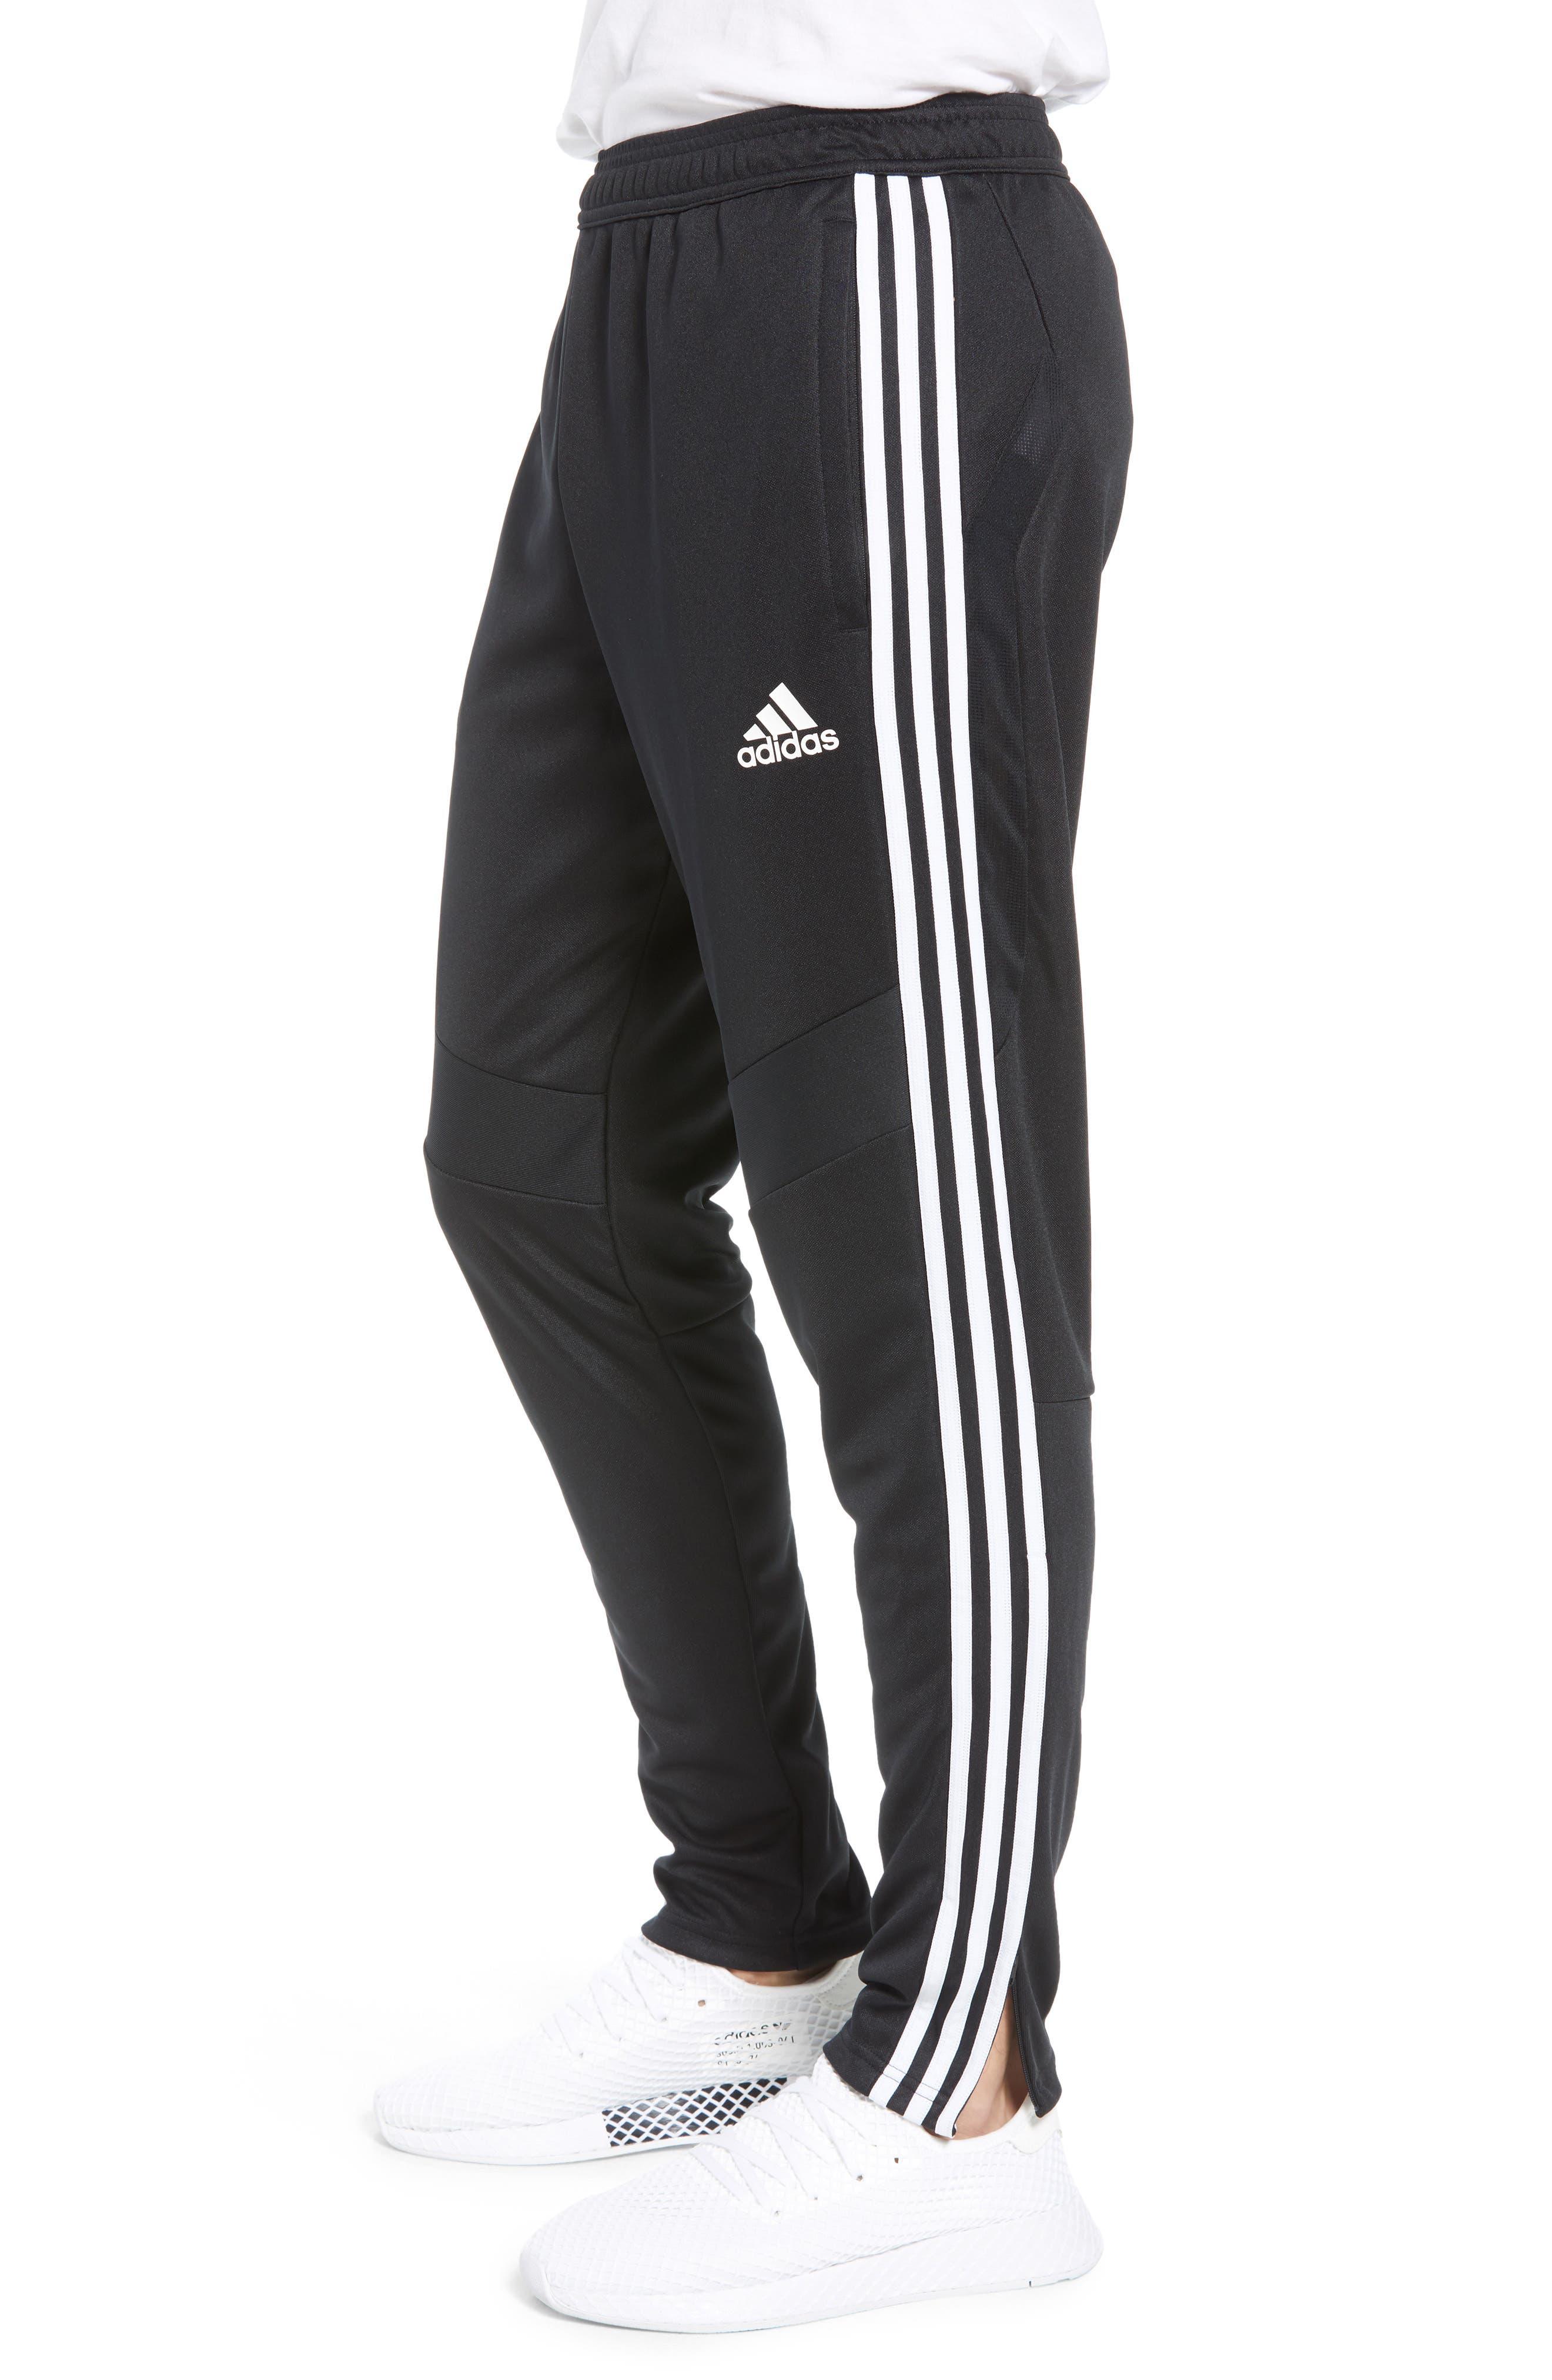 ADIDAS,                             Tiro Soccer Training Pants,                             Alternate thumbnail 3, color,                             BLACK/ WHITE